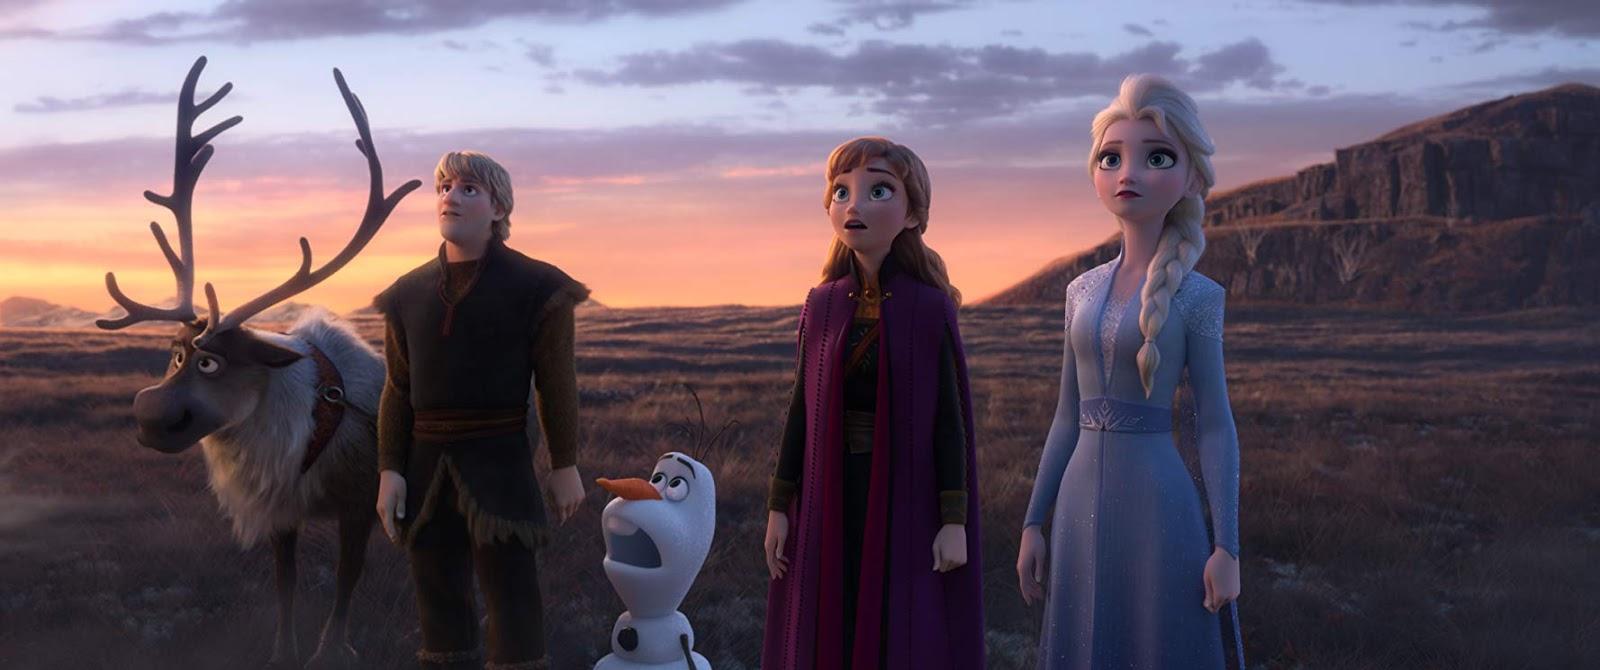 MOVIES: Frozen II - Review